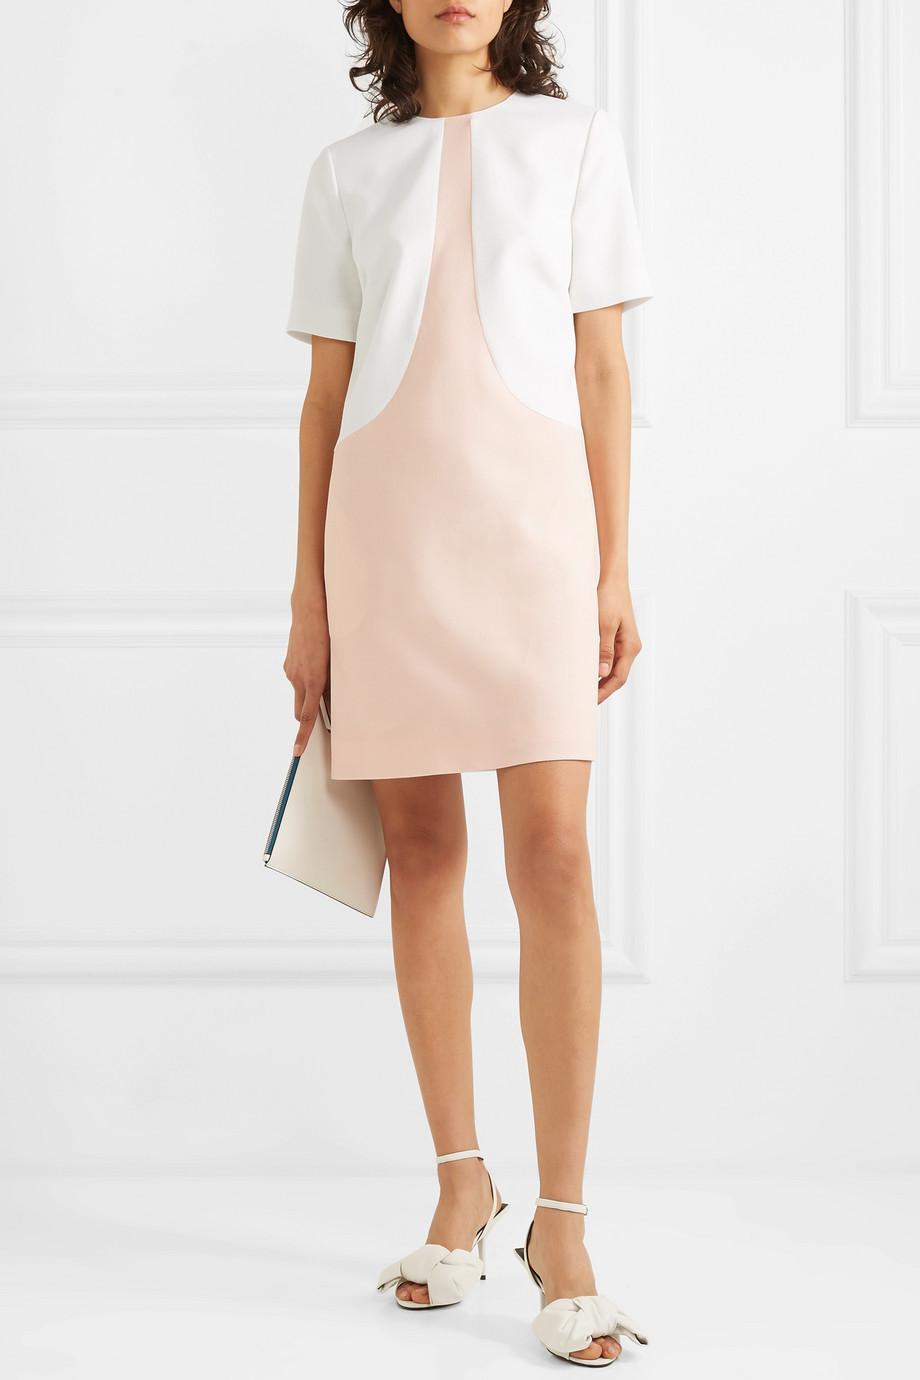 Givenchy Two-tone wool-crepe mini dress